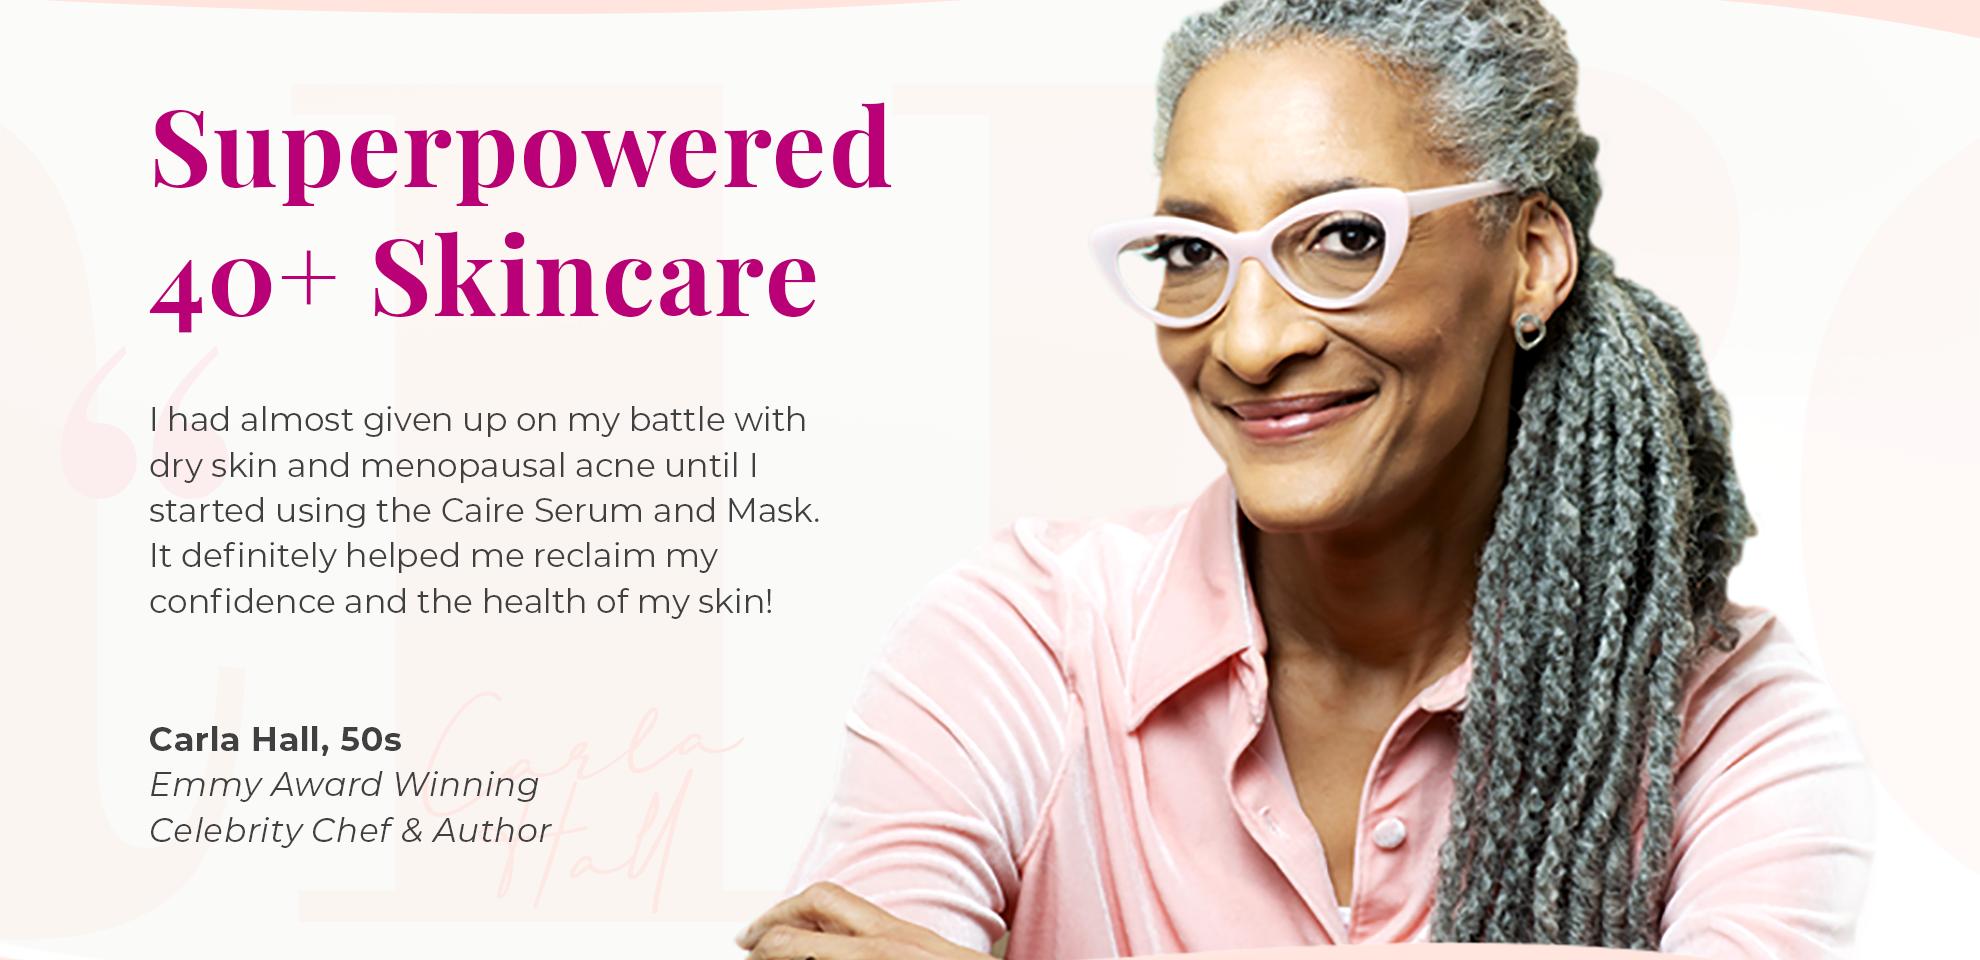 Superpowered 40+ Skincare